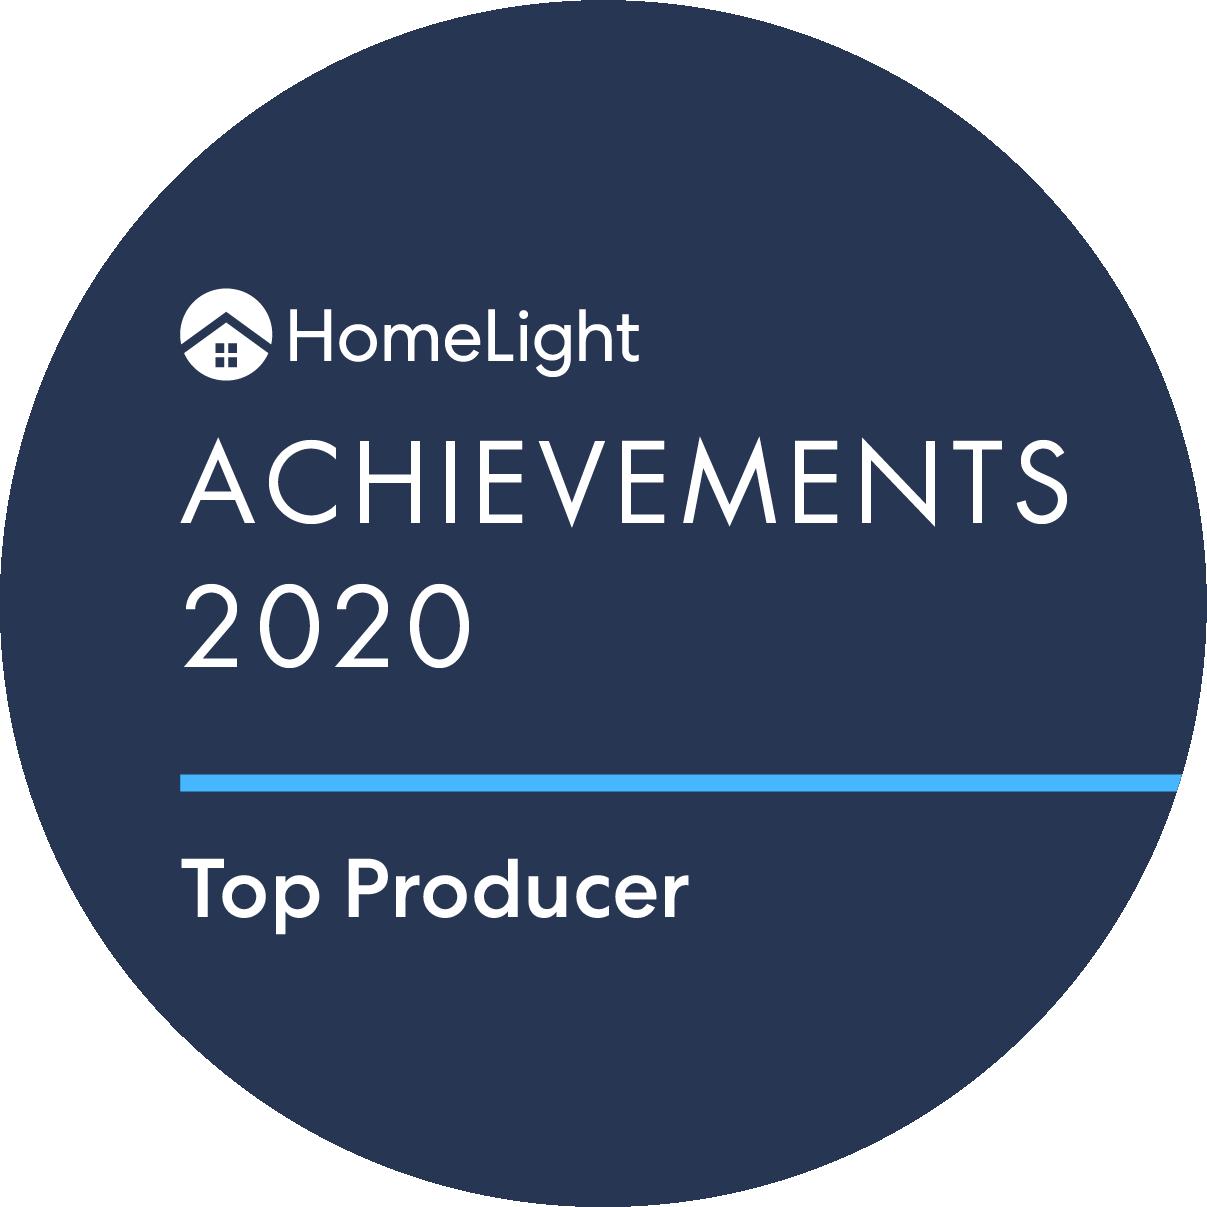 HomeLight Achievement Winner - Zen Ziejewski - Top California Real Estate Agent